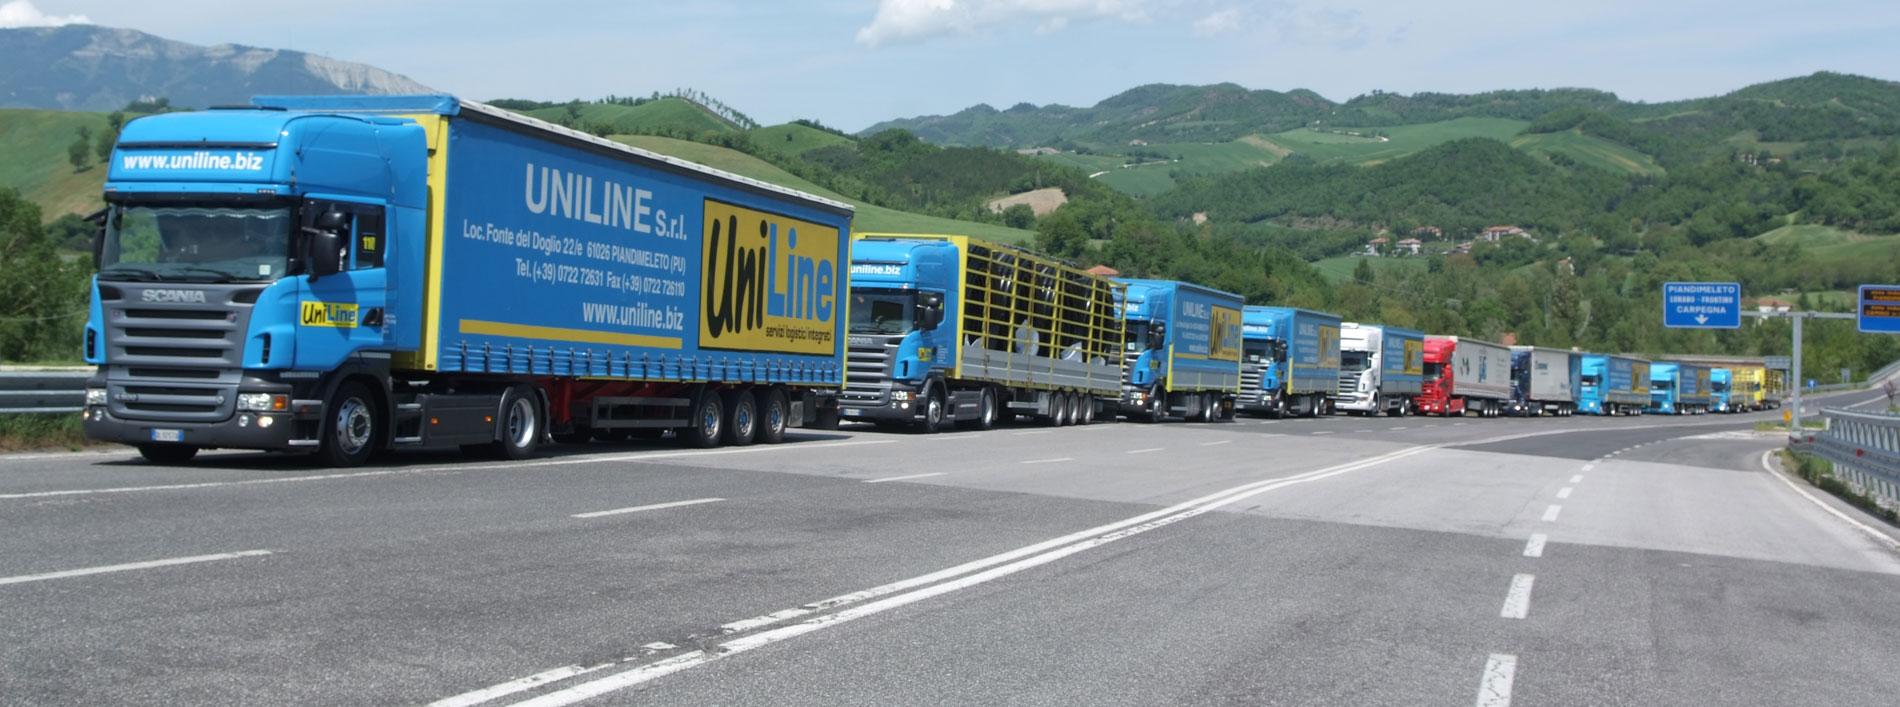 Servizi Logistici Integrati UNILINE